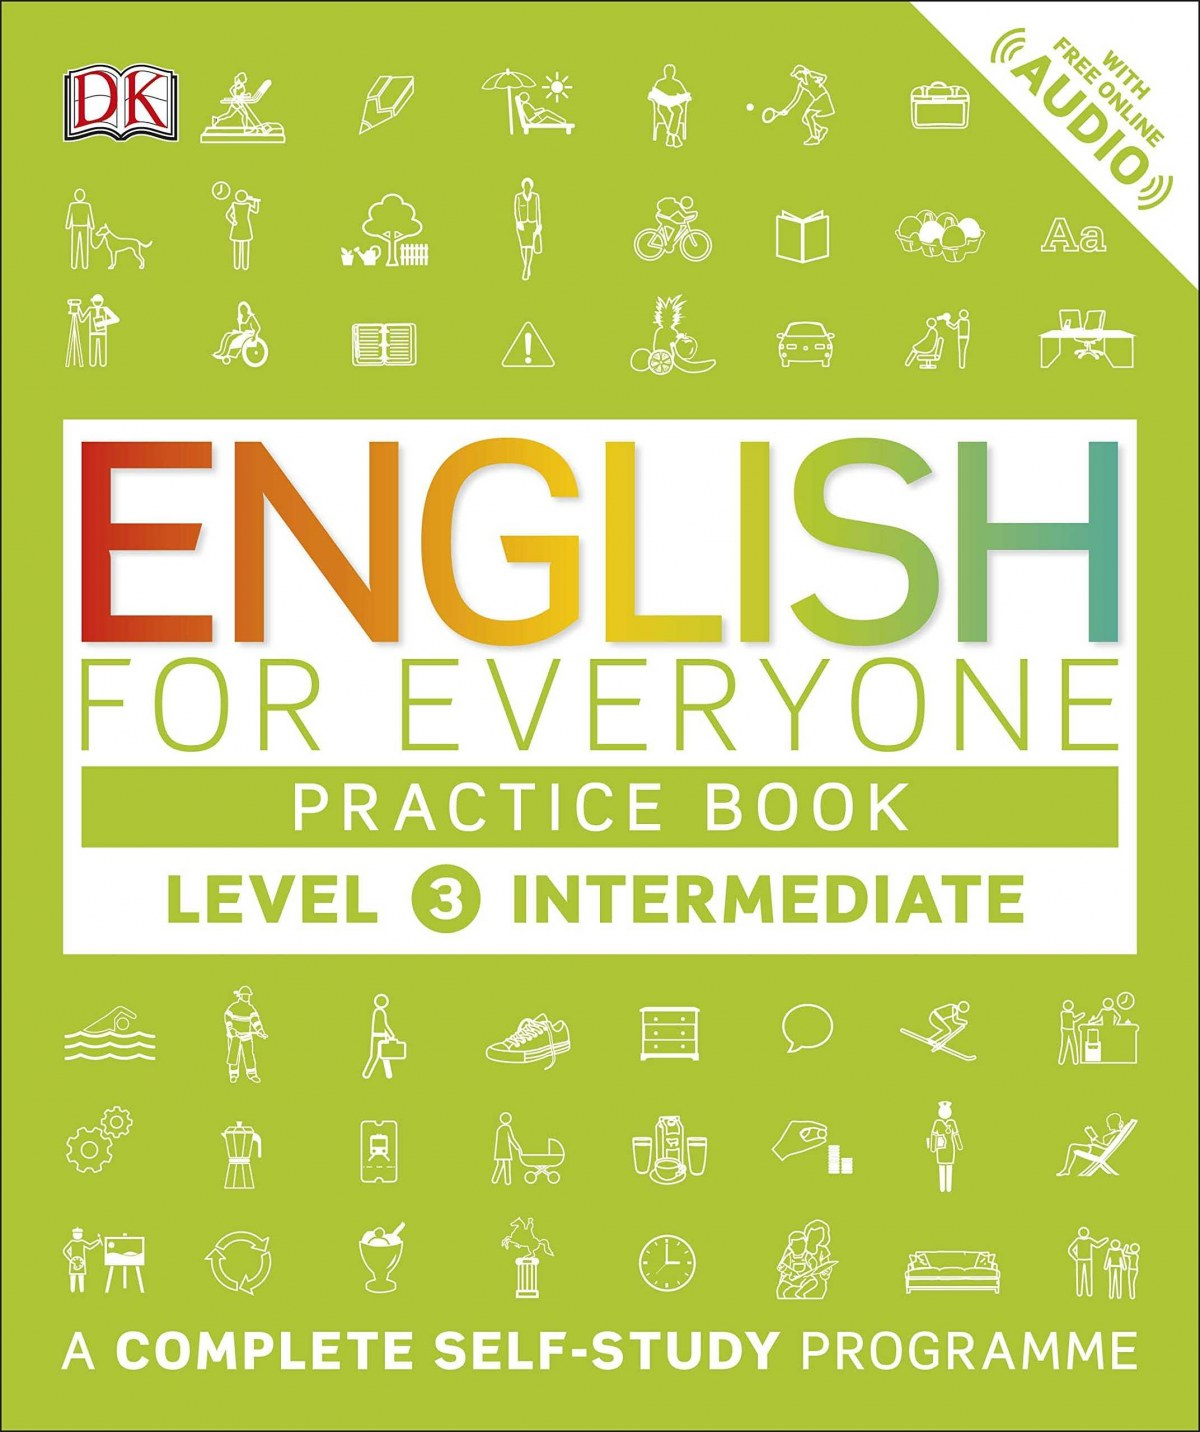 ENGLISH EVERYONE PRACTICE BOOK LEVEL 3 INTERMEDIATE